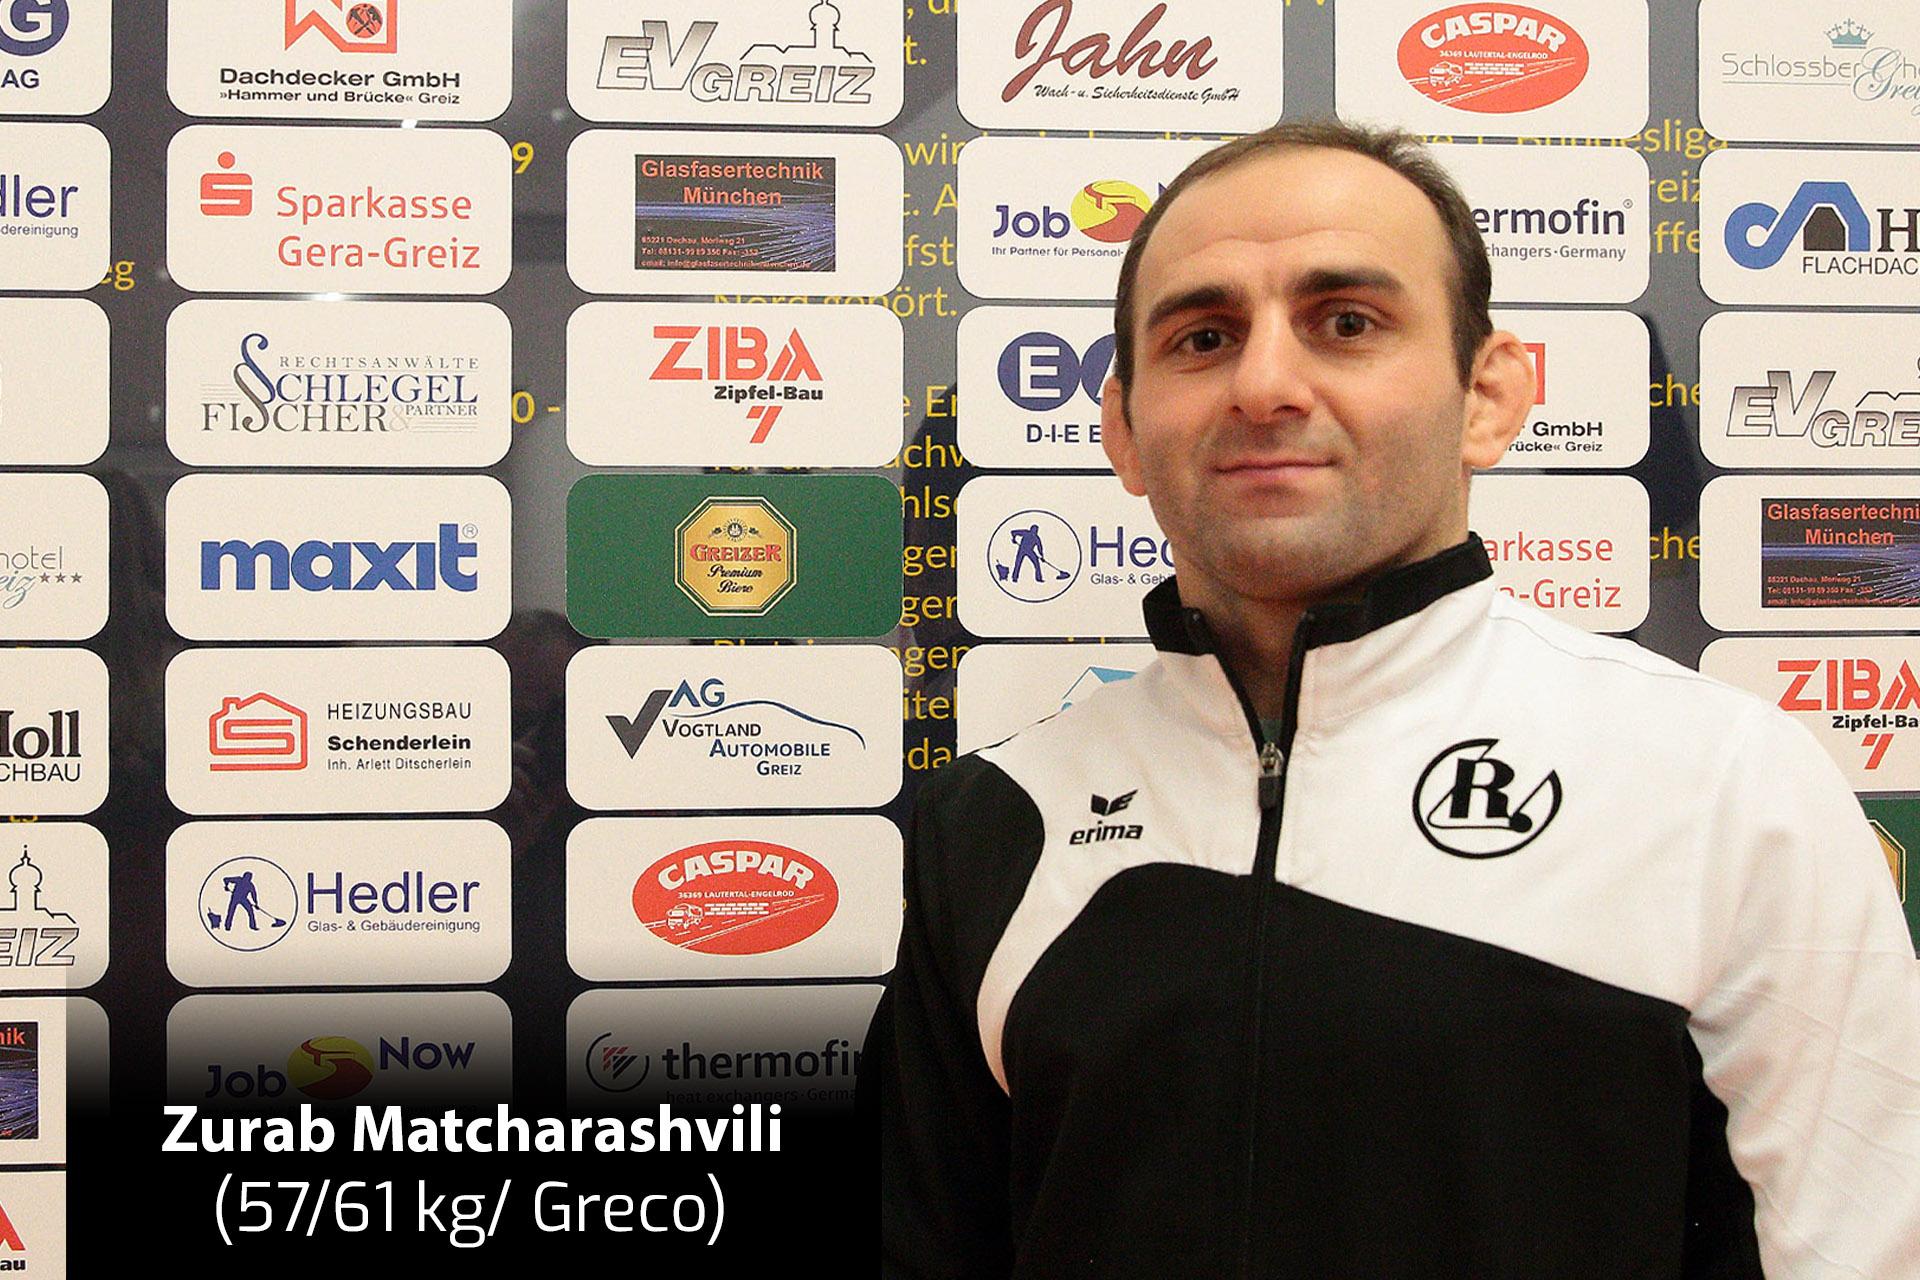 Zurab Matcharashvili